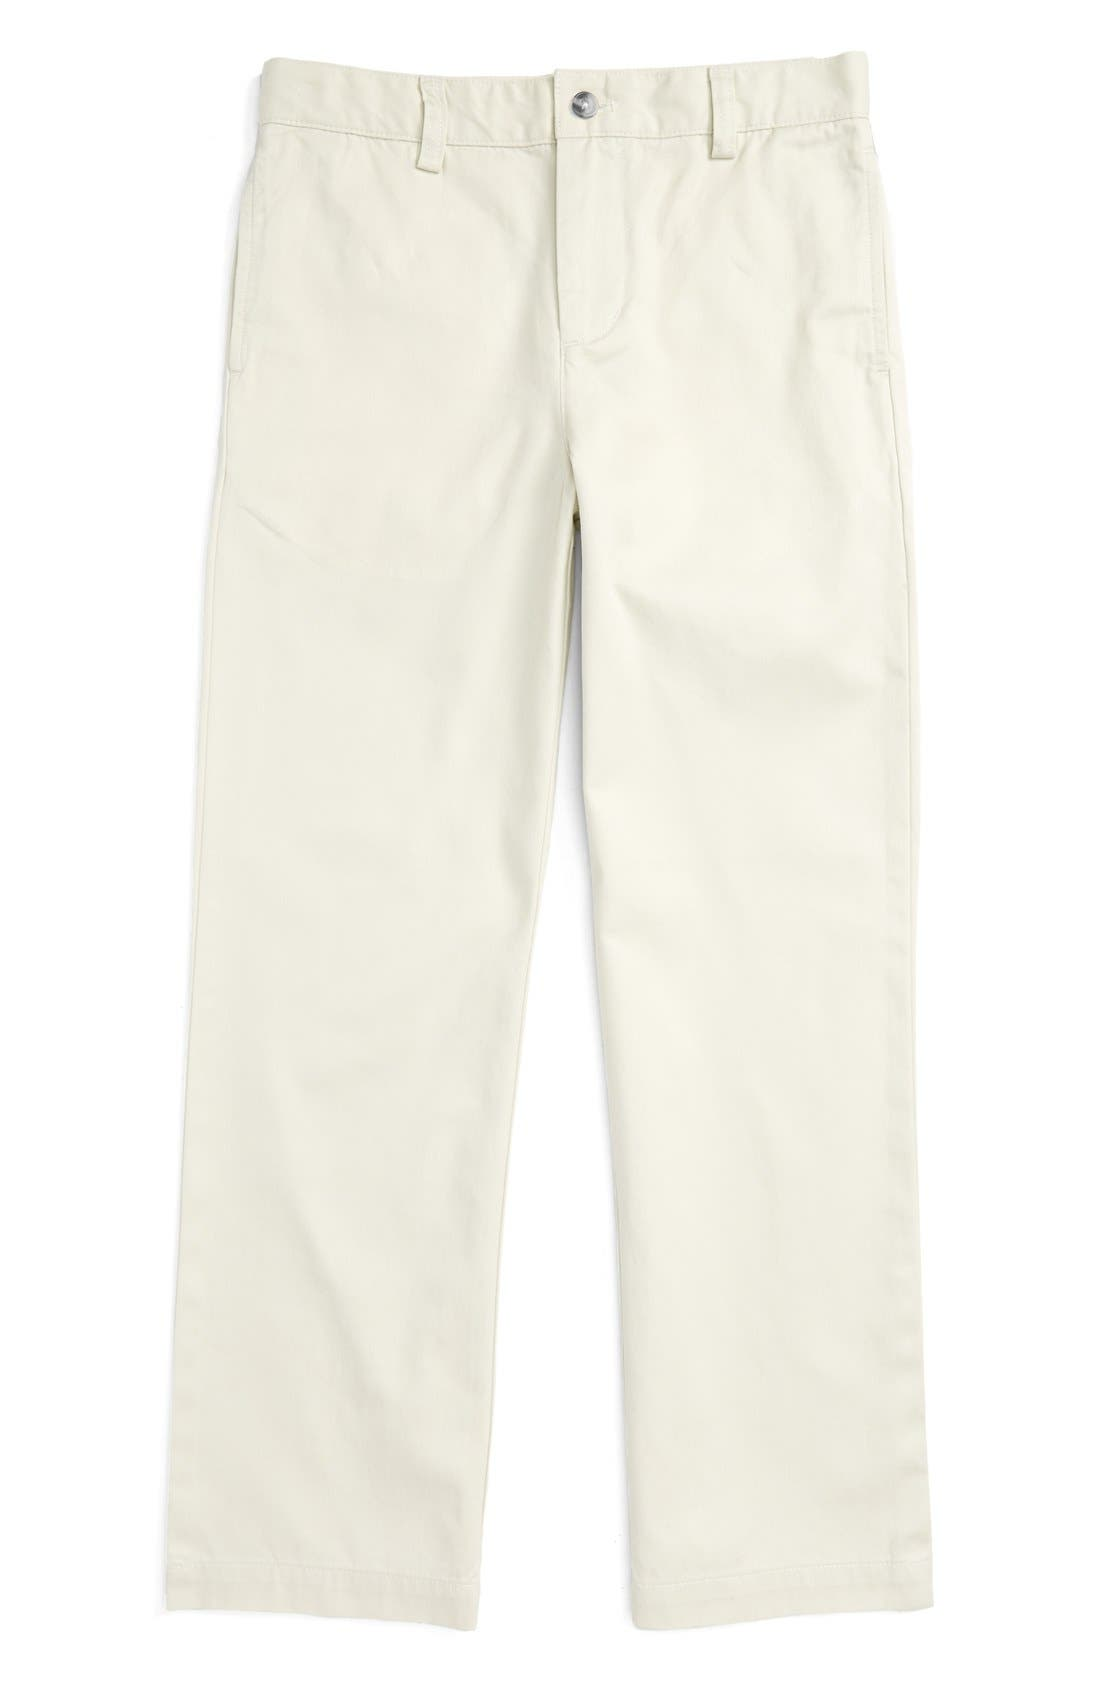 Club Cotton Twill Pants,                             Main thumbnail 1, color,                             Stone